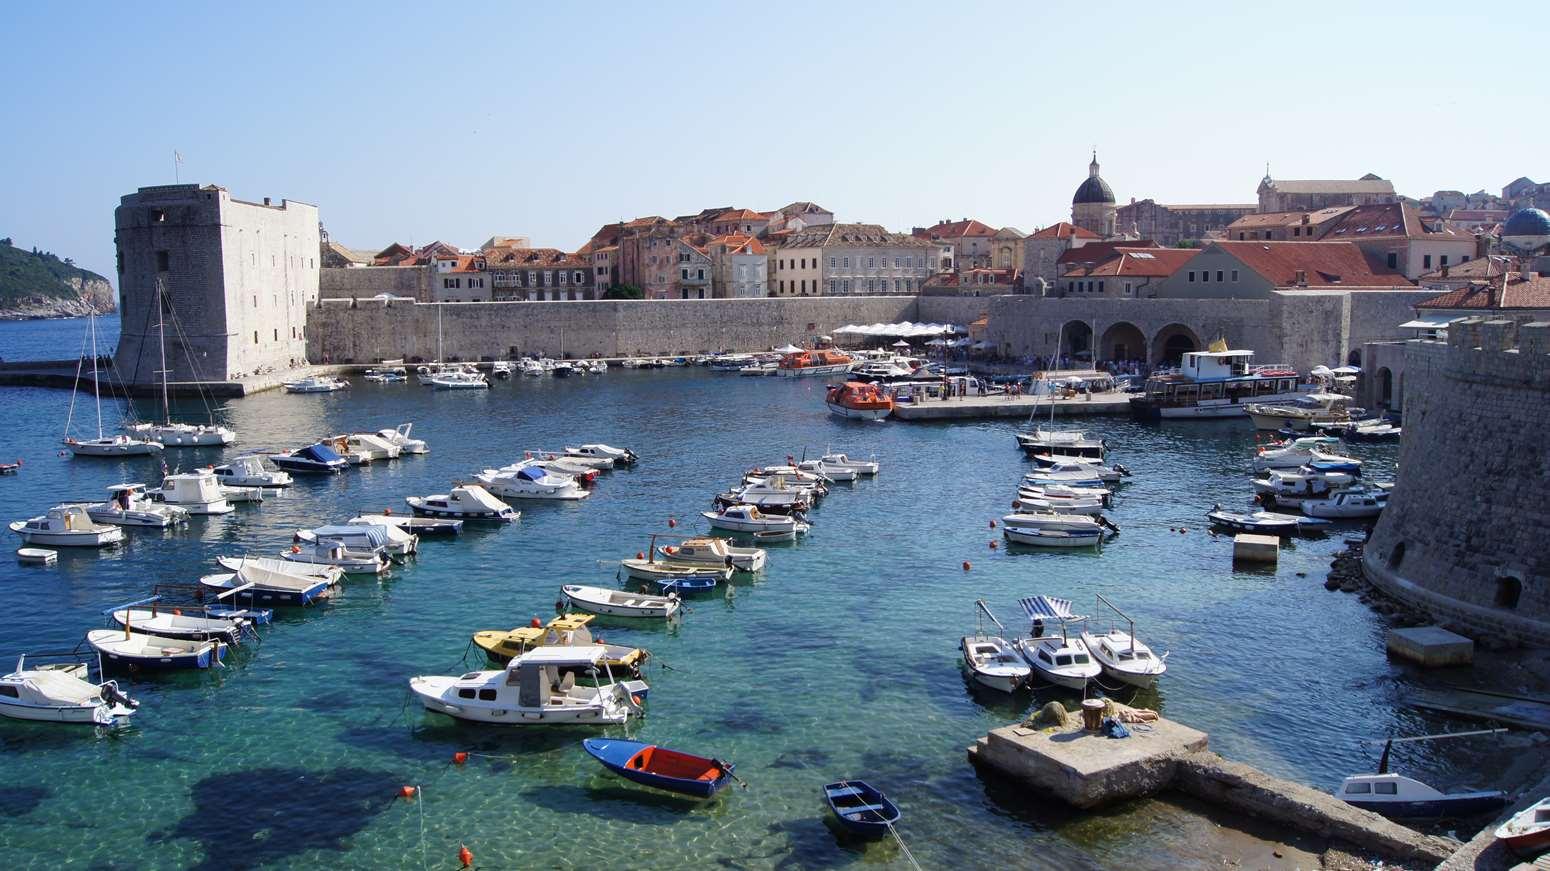 Tanie noclegi w chorwacji nad morzem europa allegro